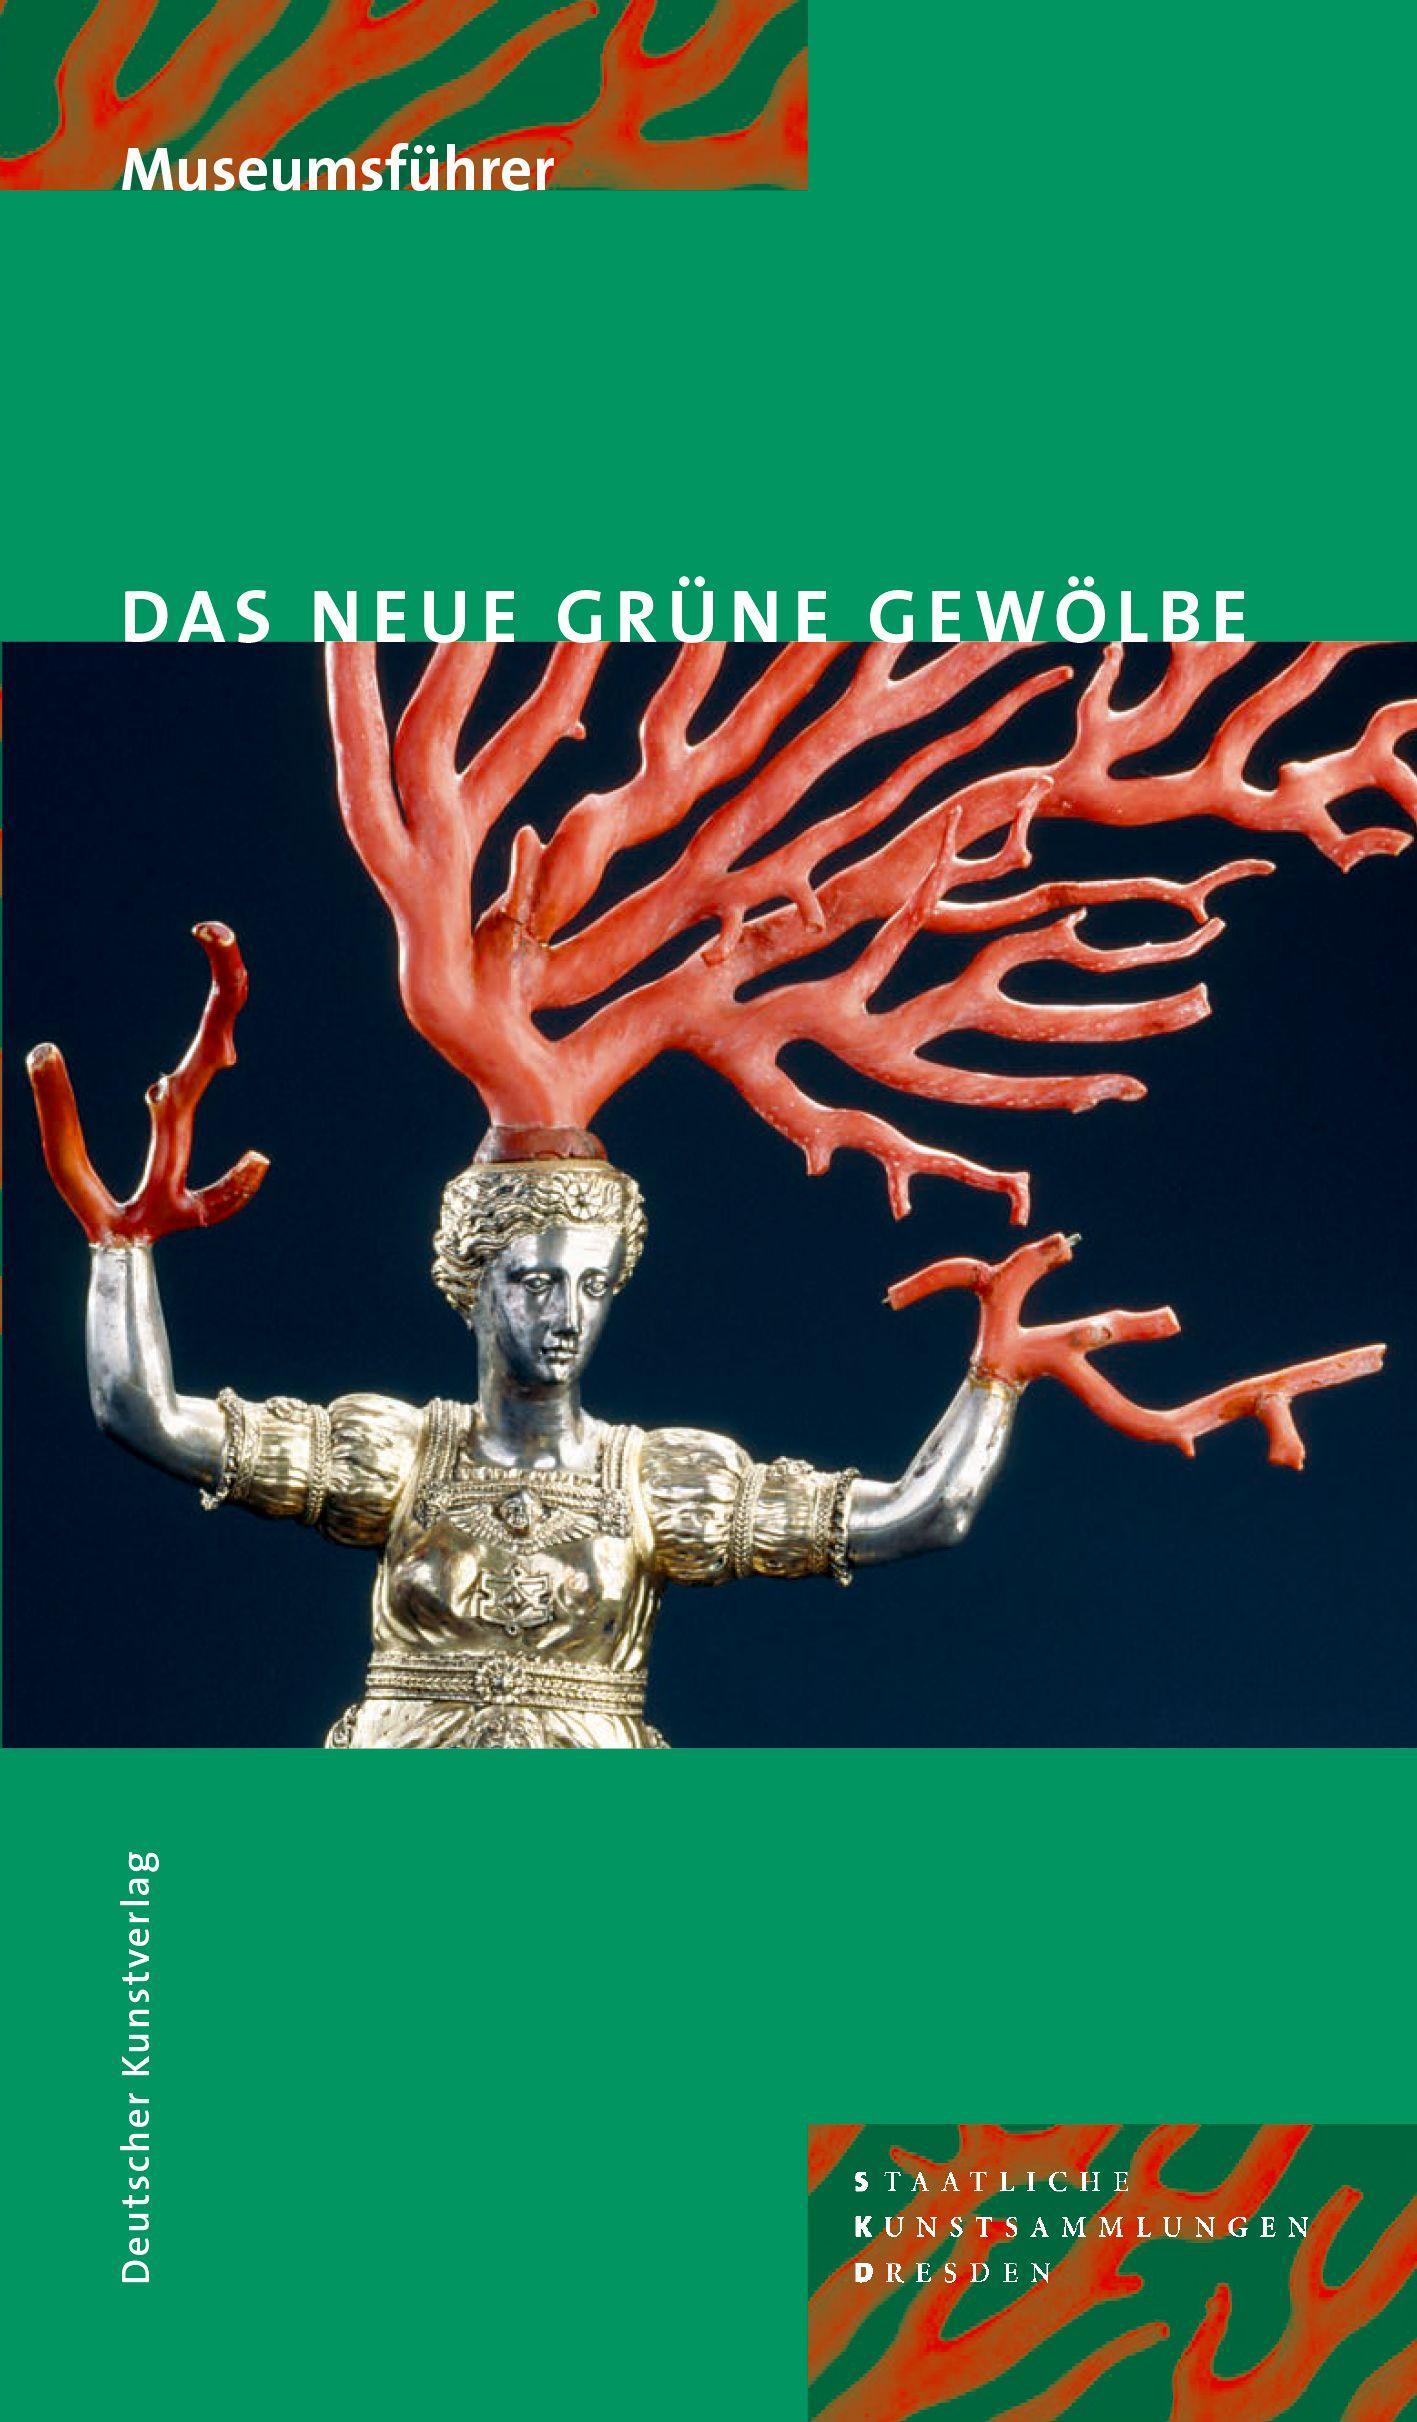 Das Neue Grüne Gewölbe. Museumsführer Jutta Kappel